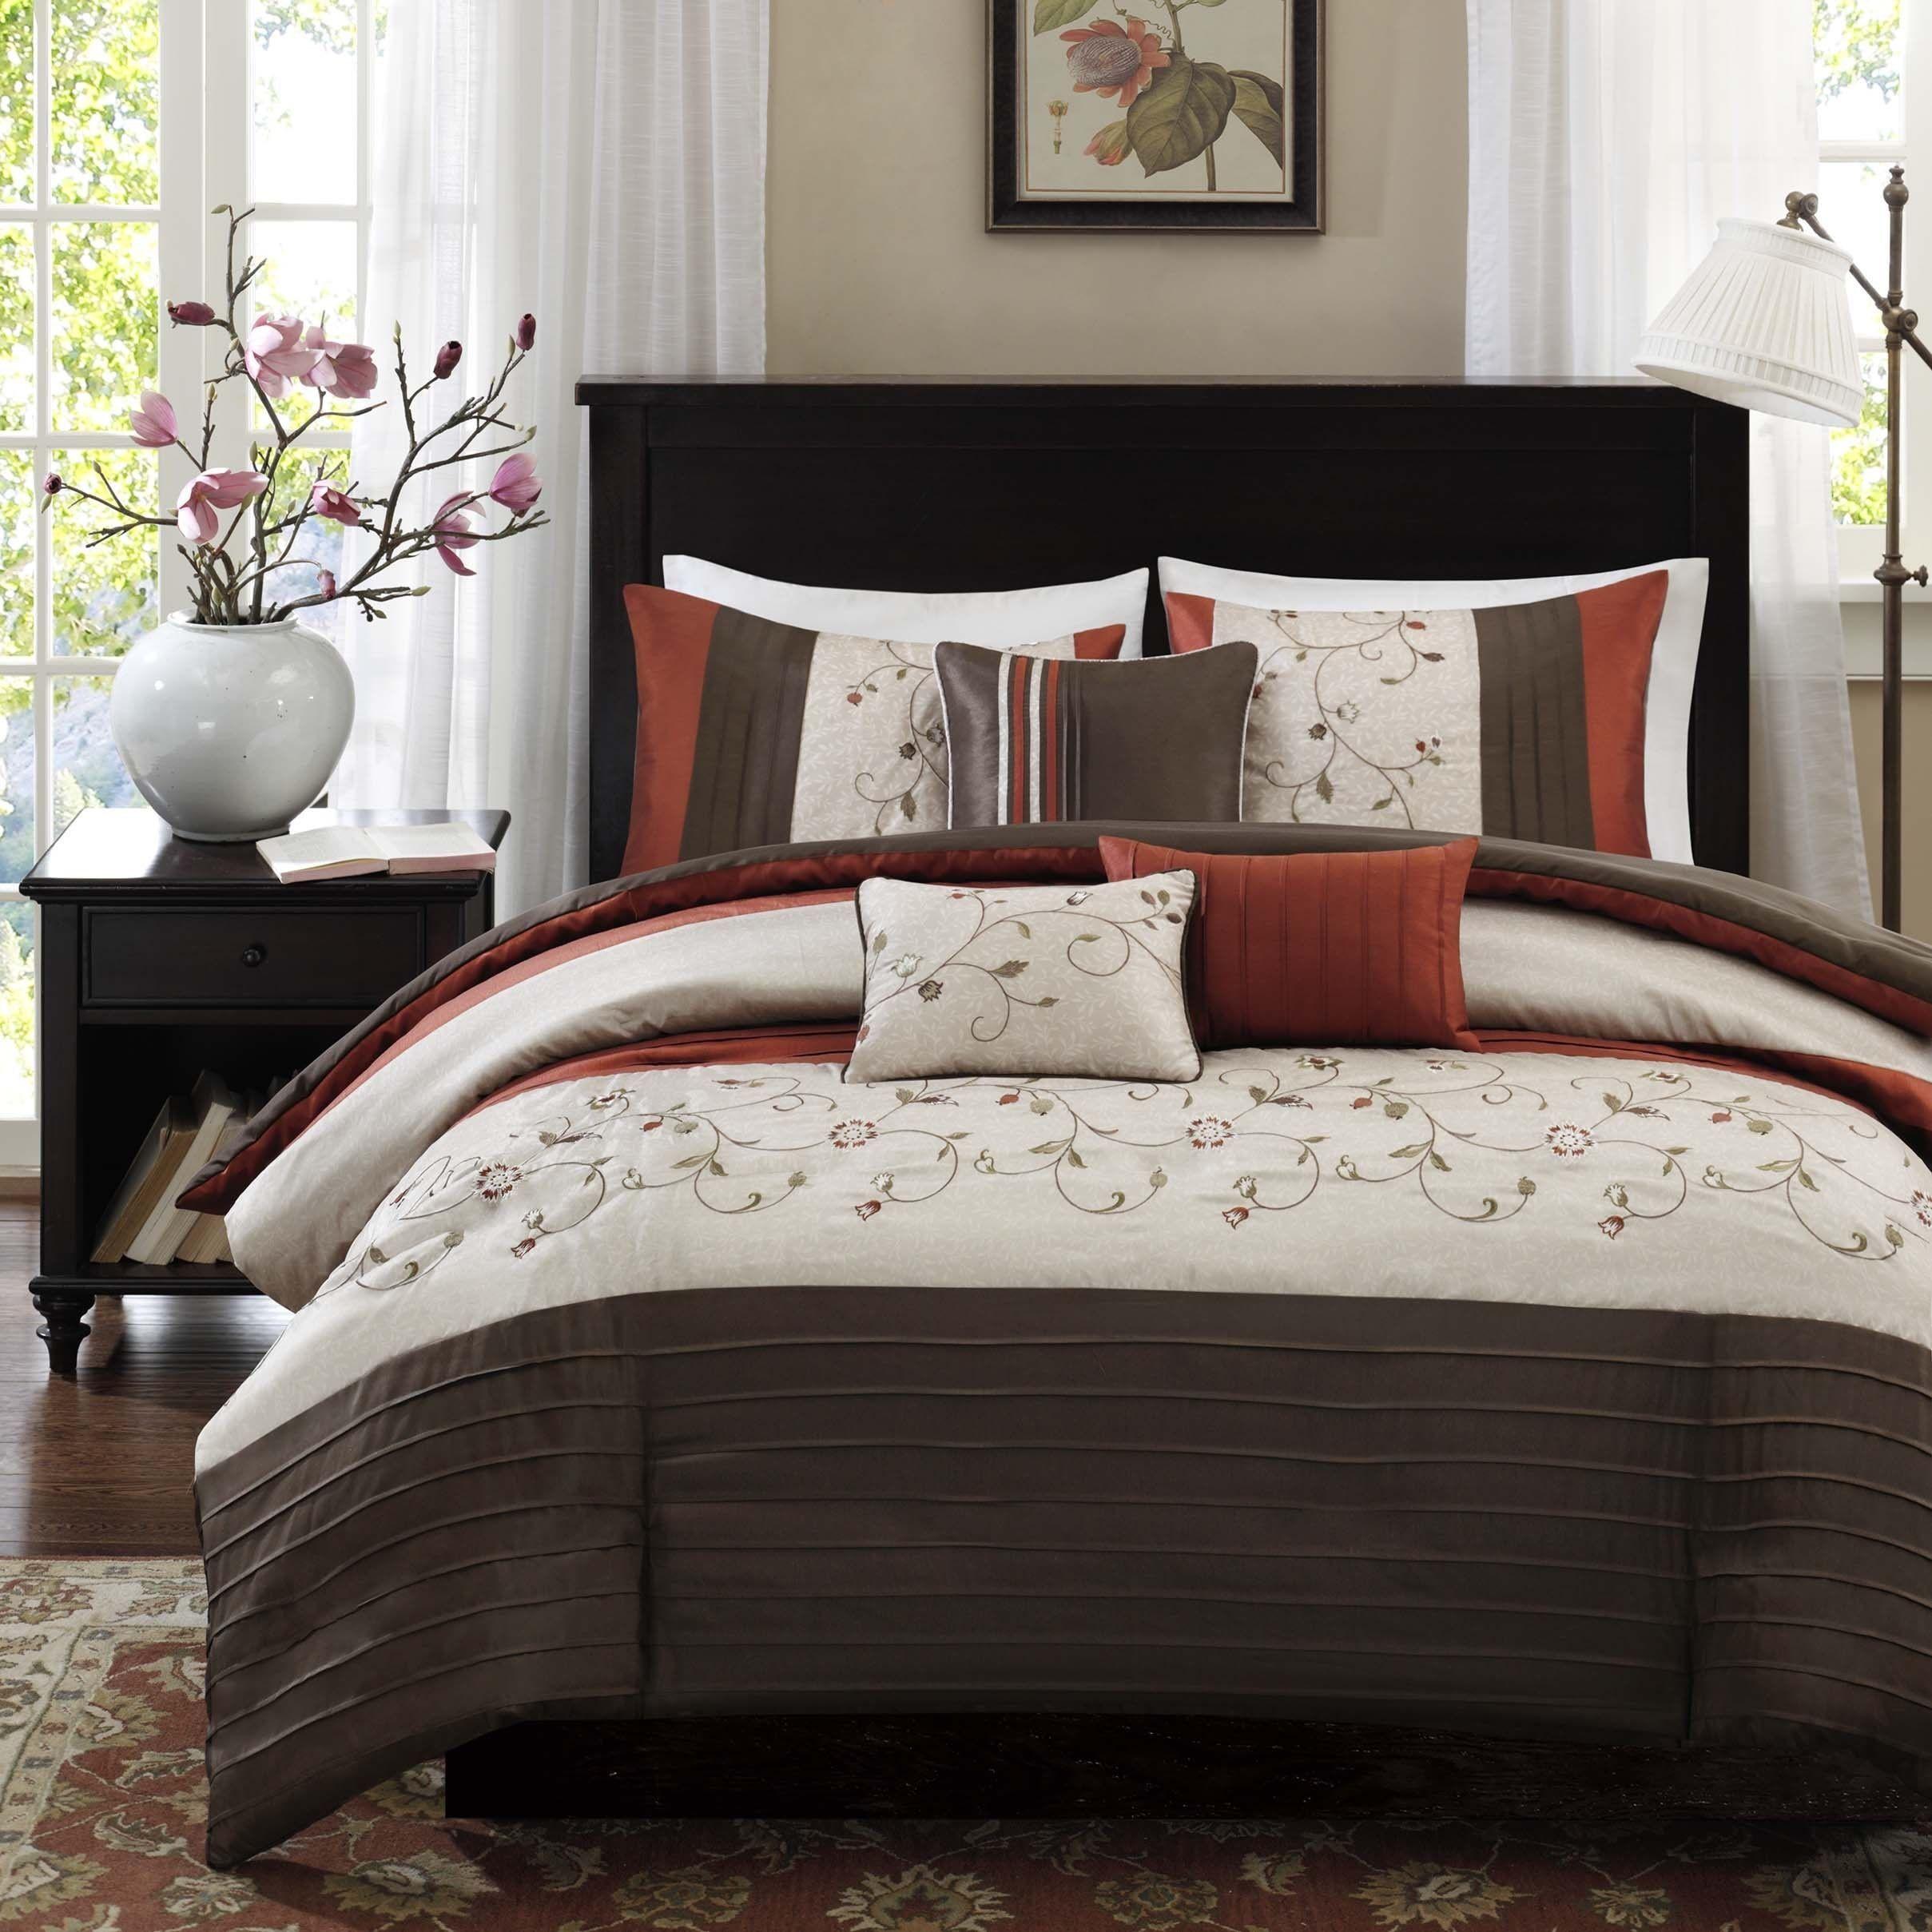 size comforter cover shop king design covers duvet sheet sets blue bed pieces